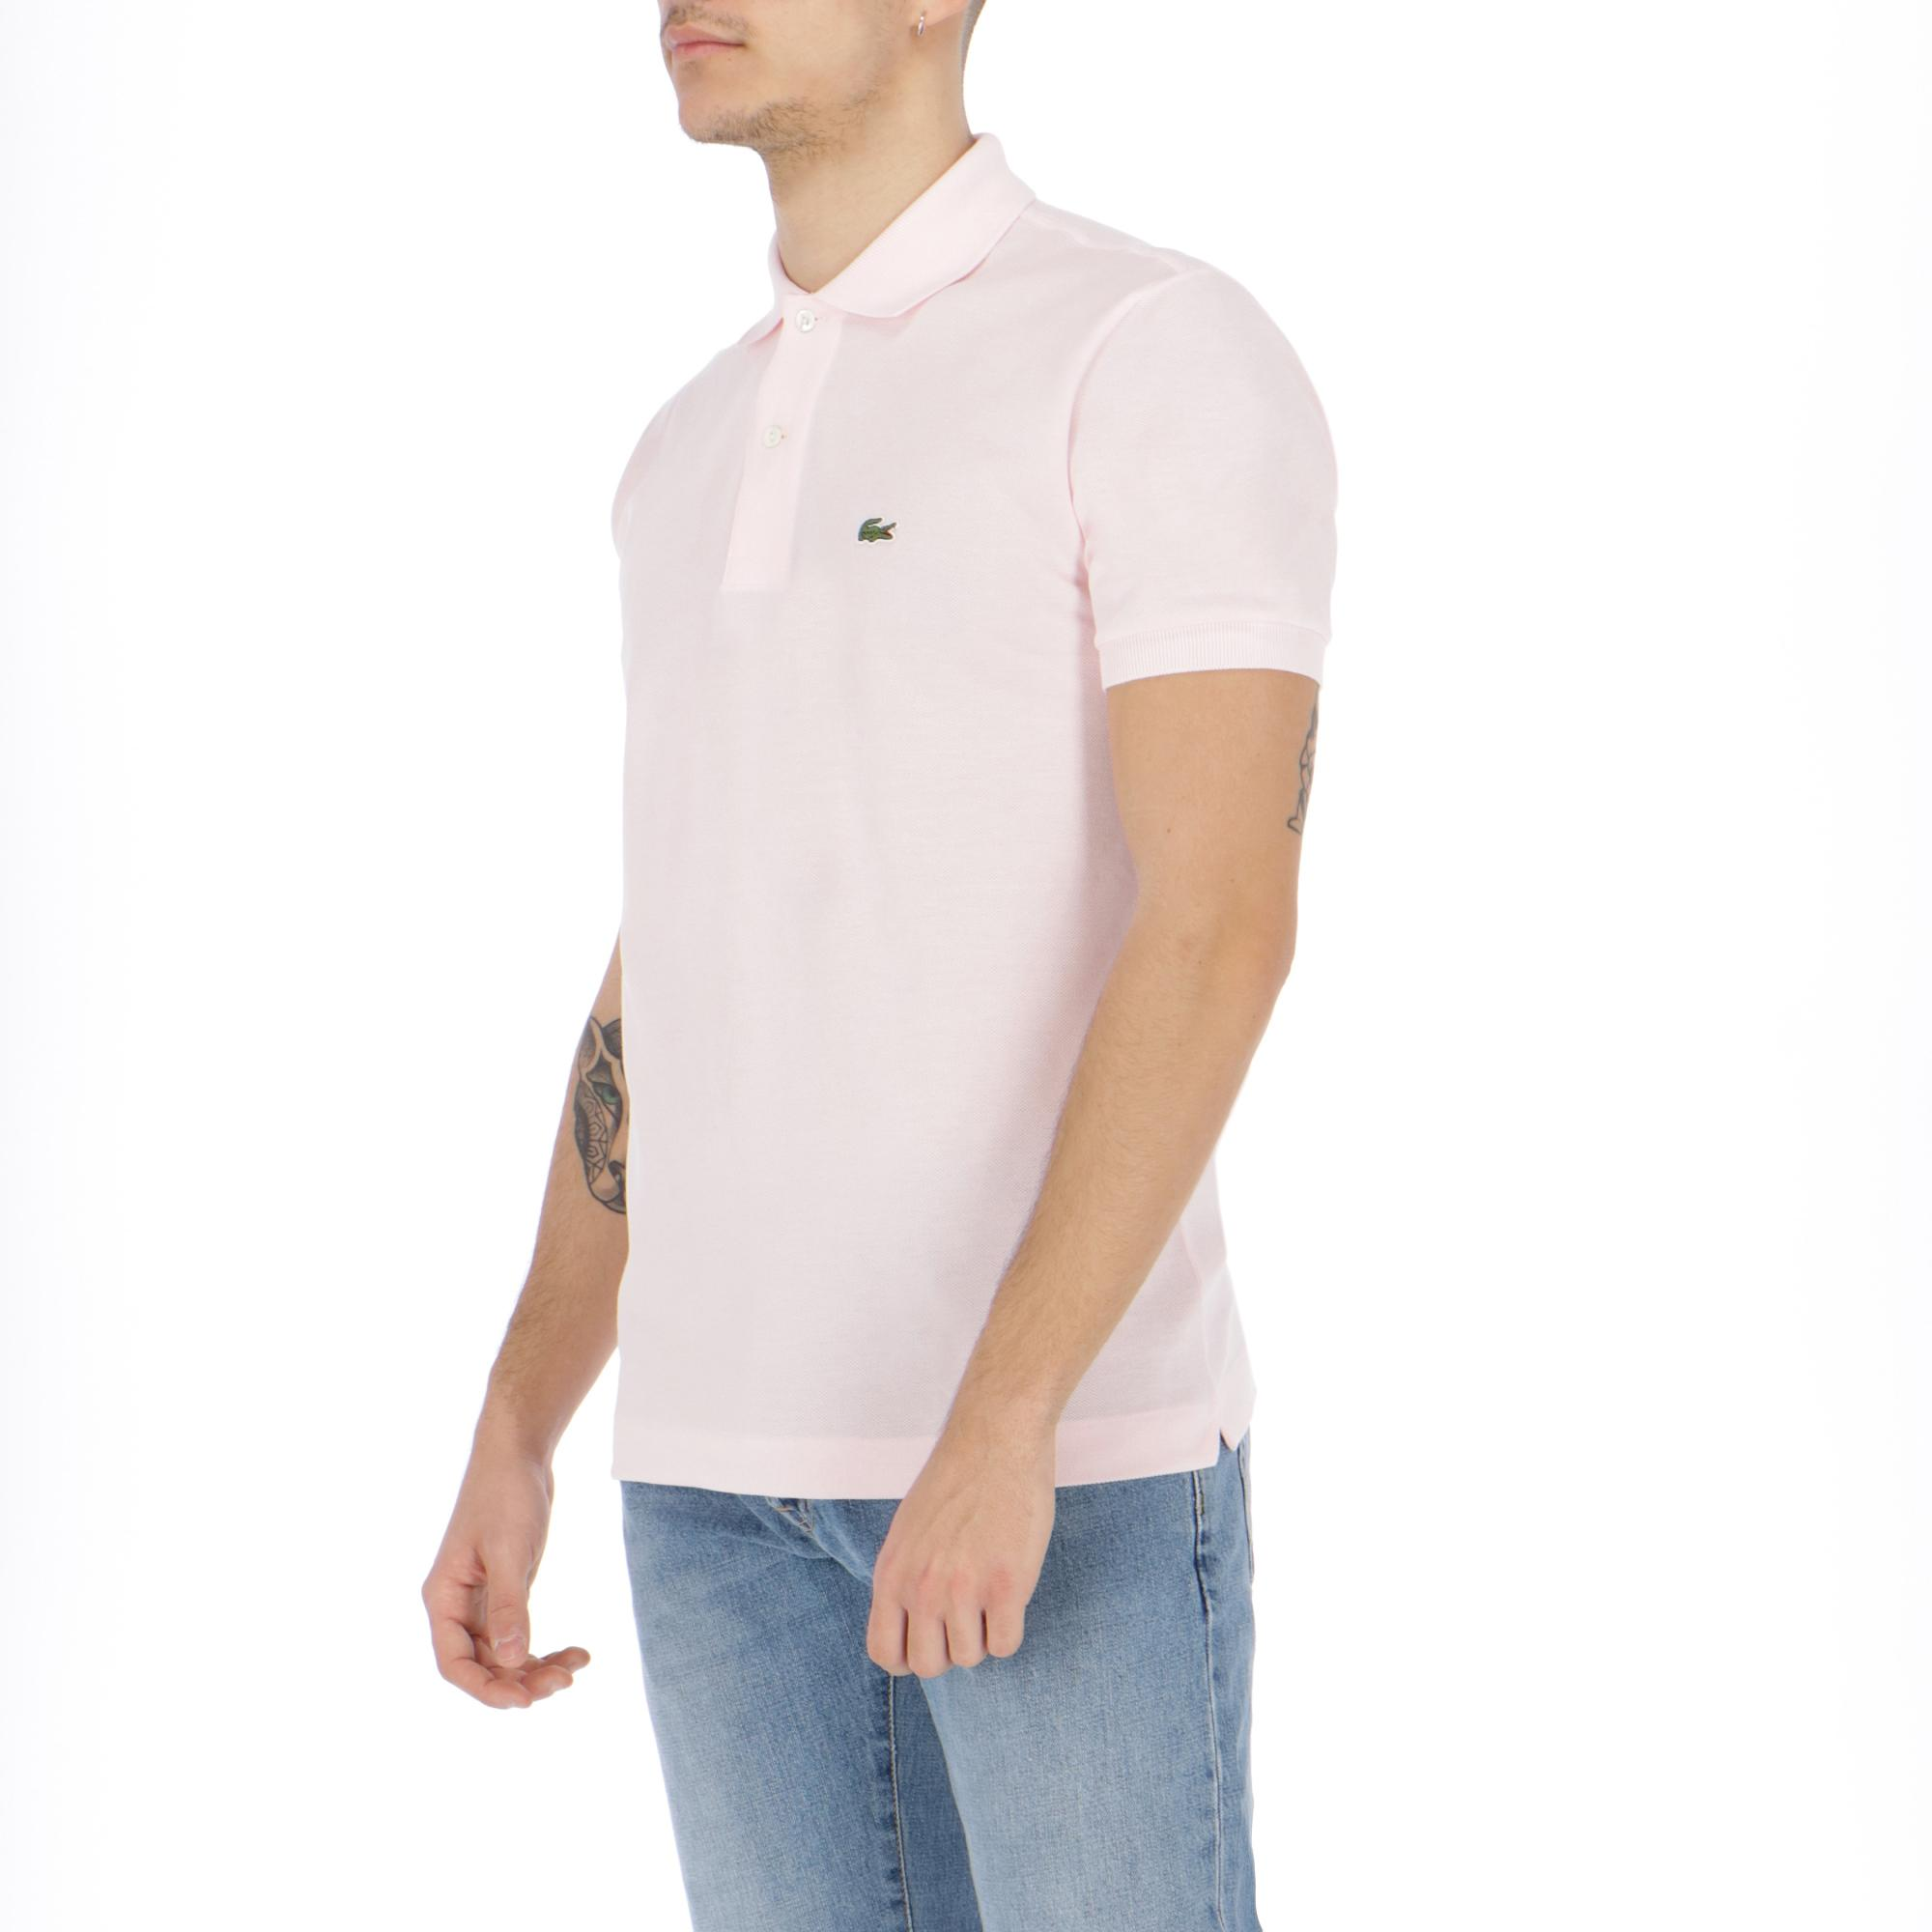 984d2fb1e Lacoste Polo Pink